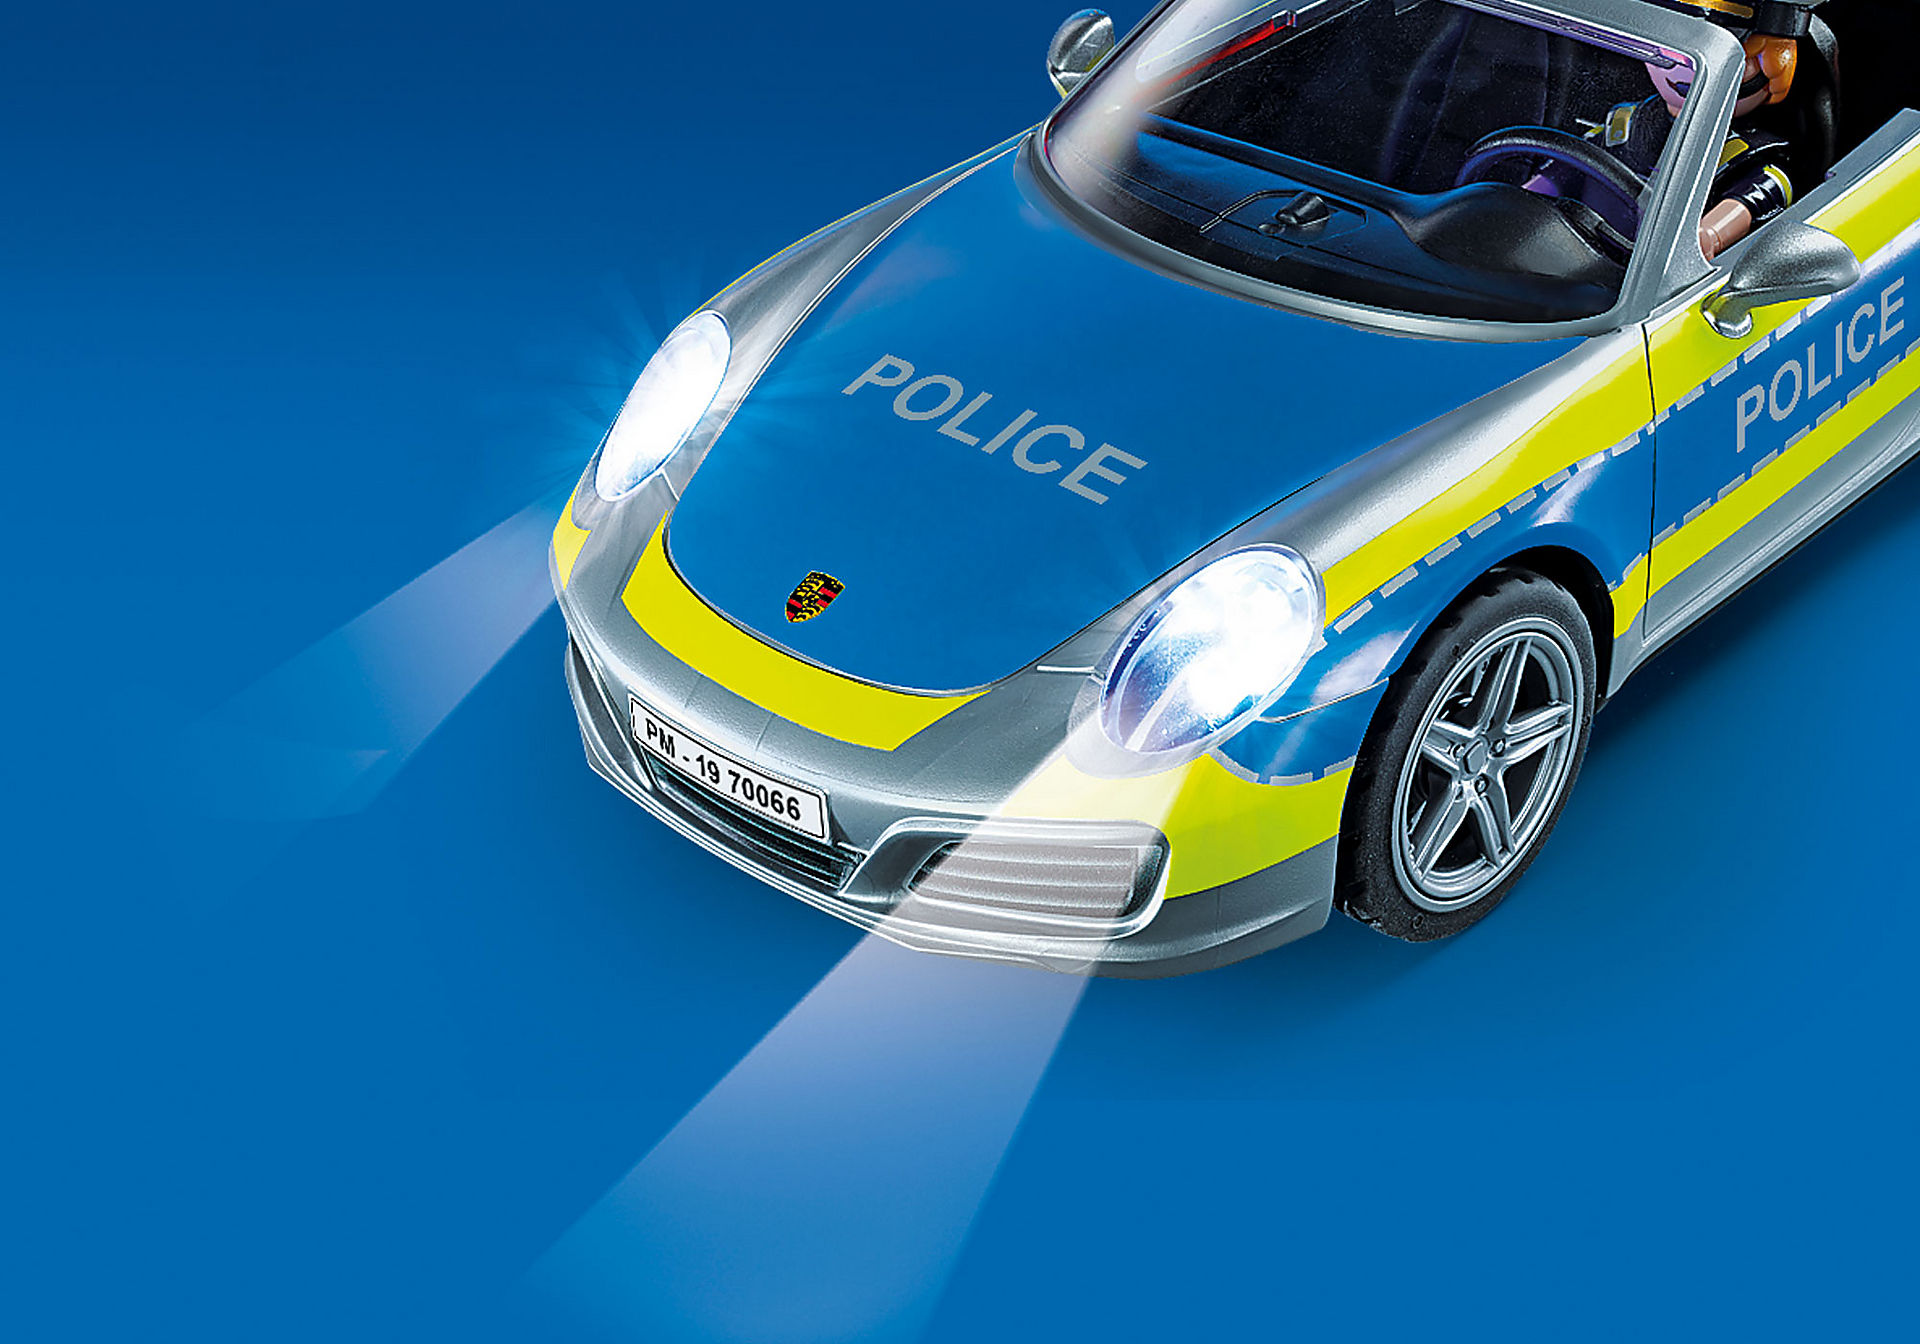 70066 Porsche 911 Carrera 4S Police zoom image5